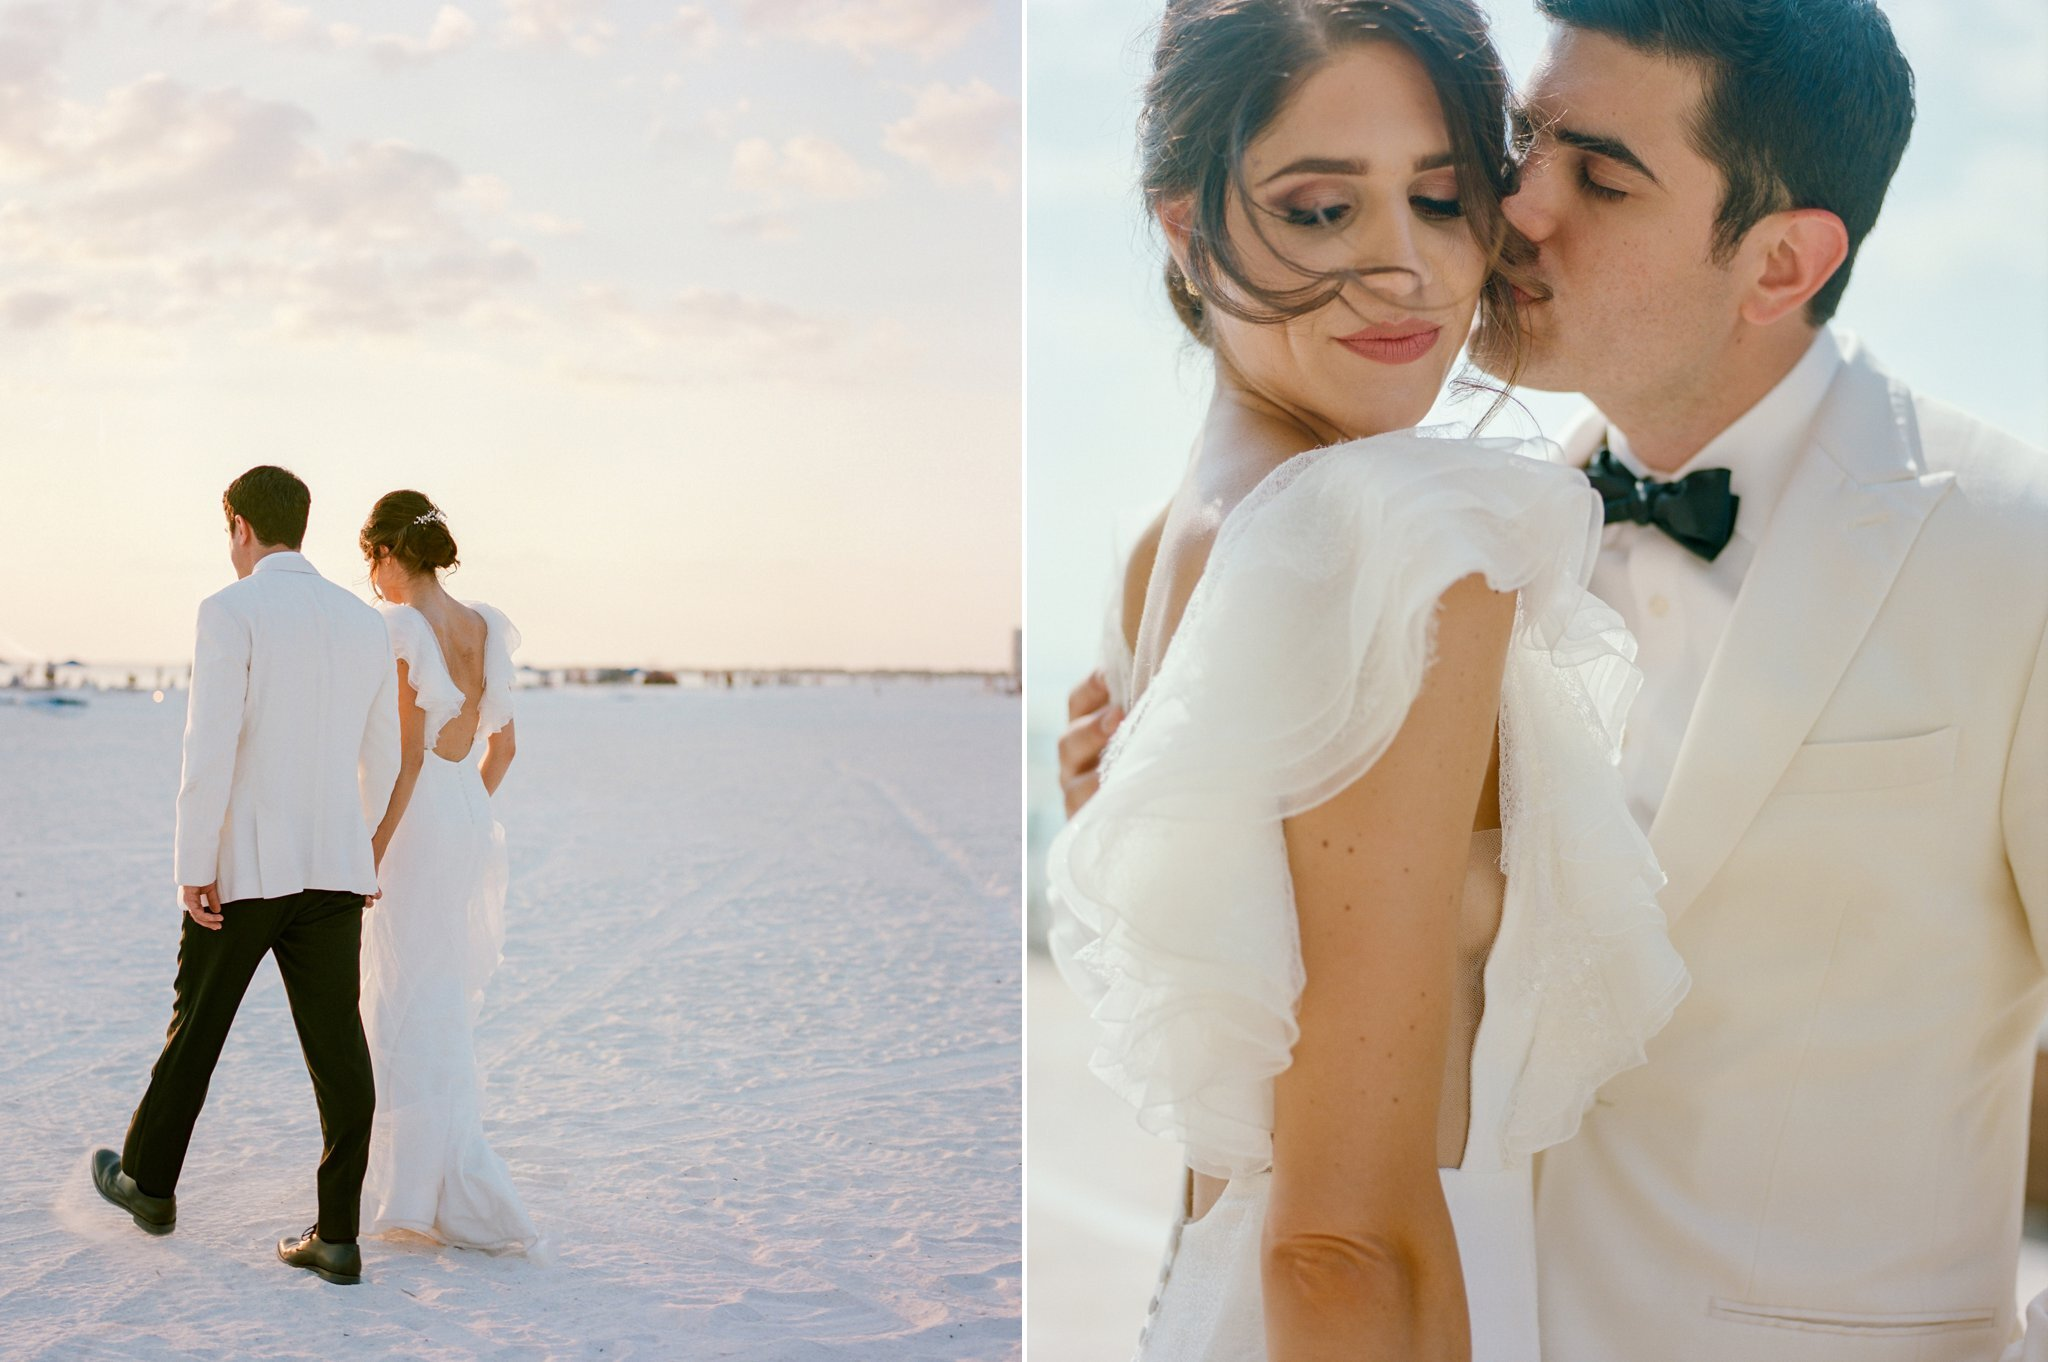 jw marriott marco island wedding photographer marco island wedding photographer shannon griffin photography_0200.jpg